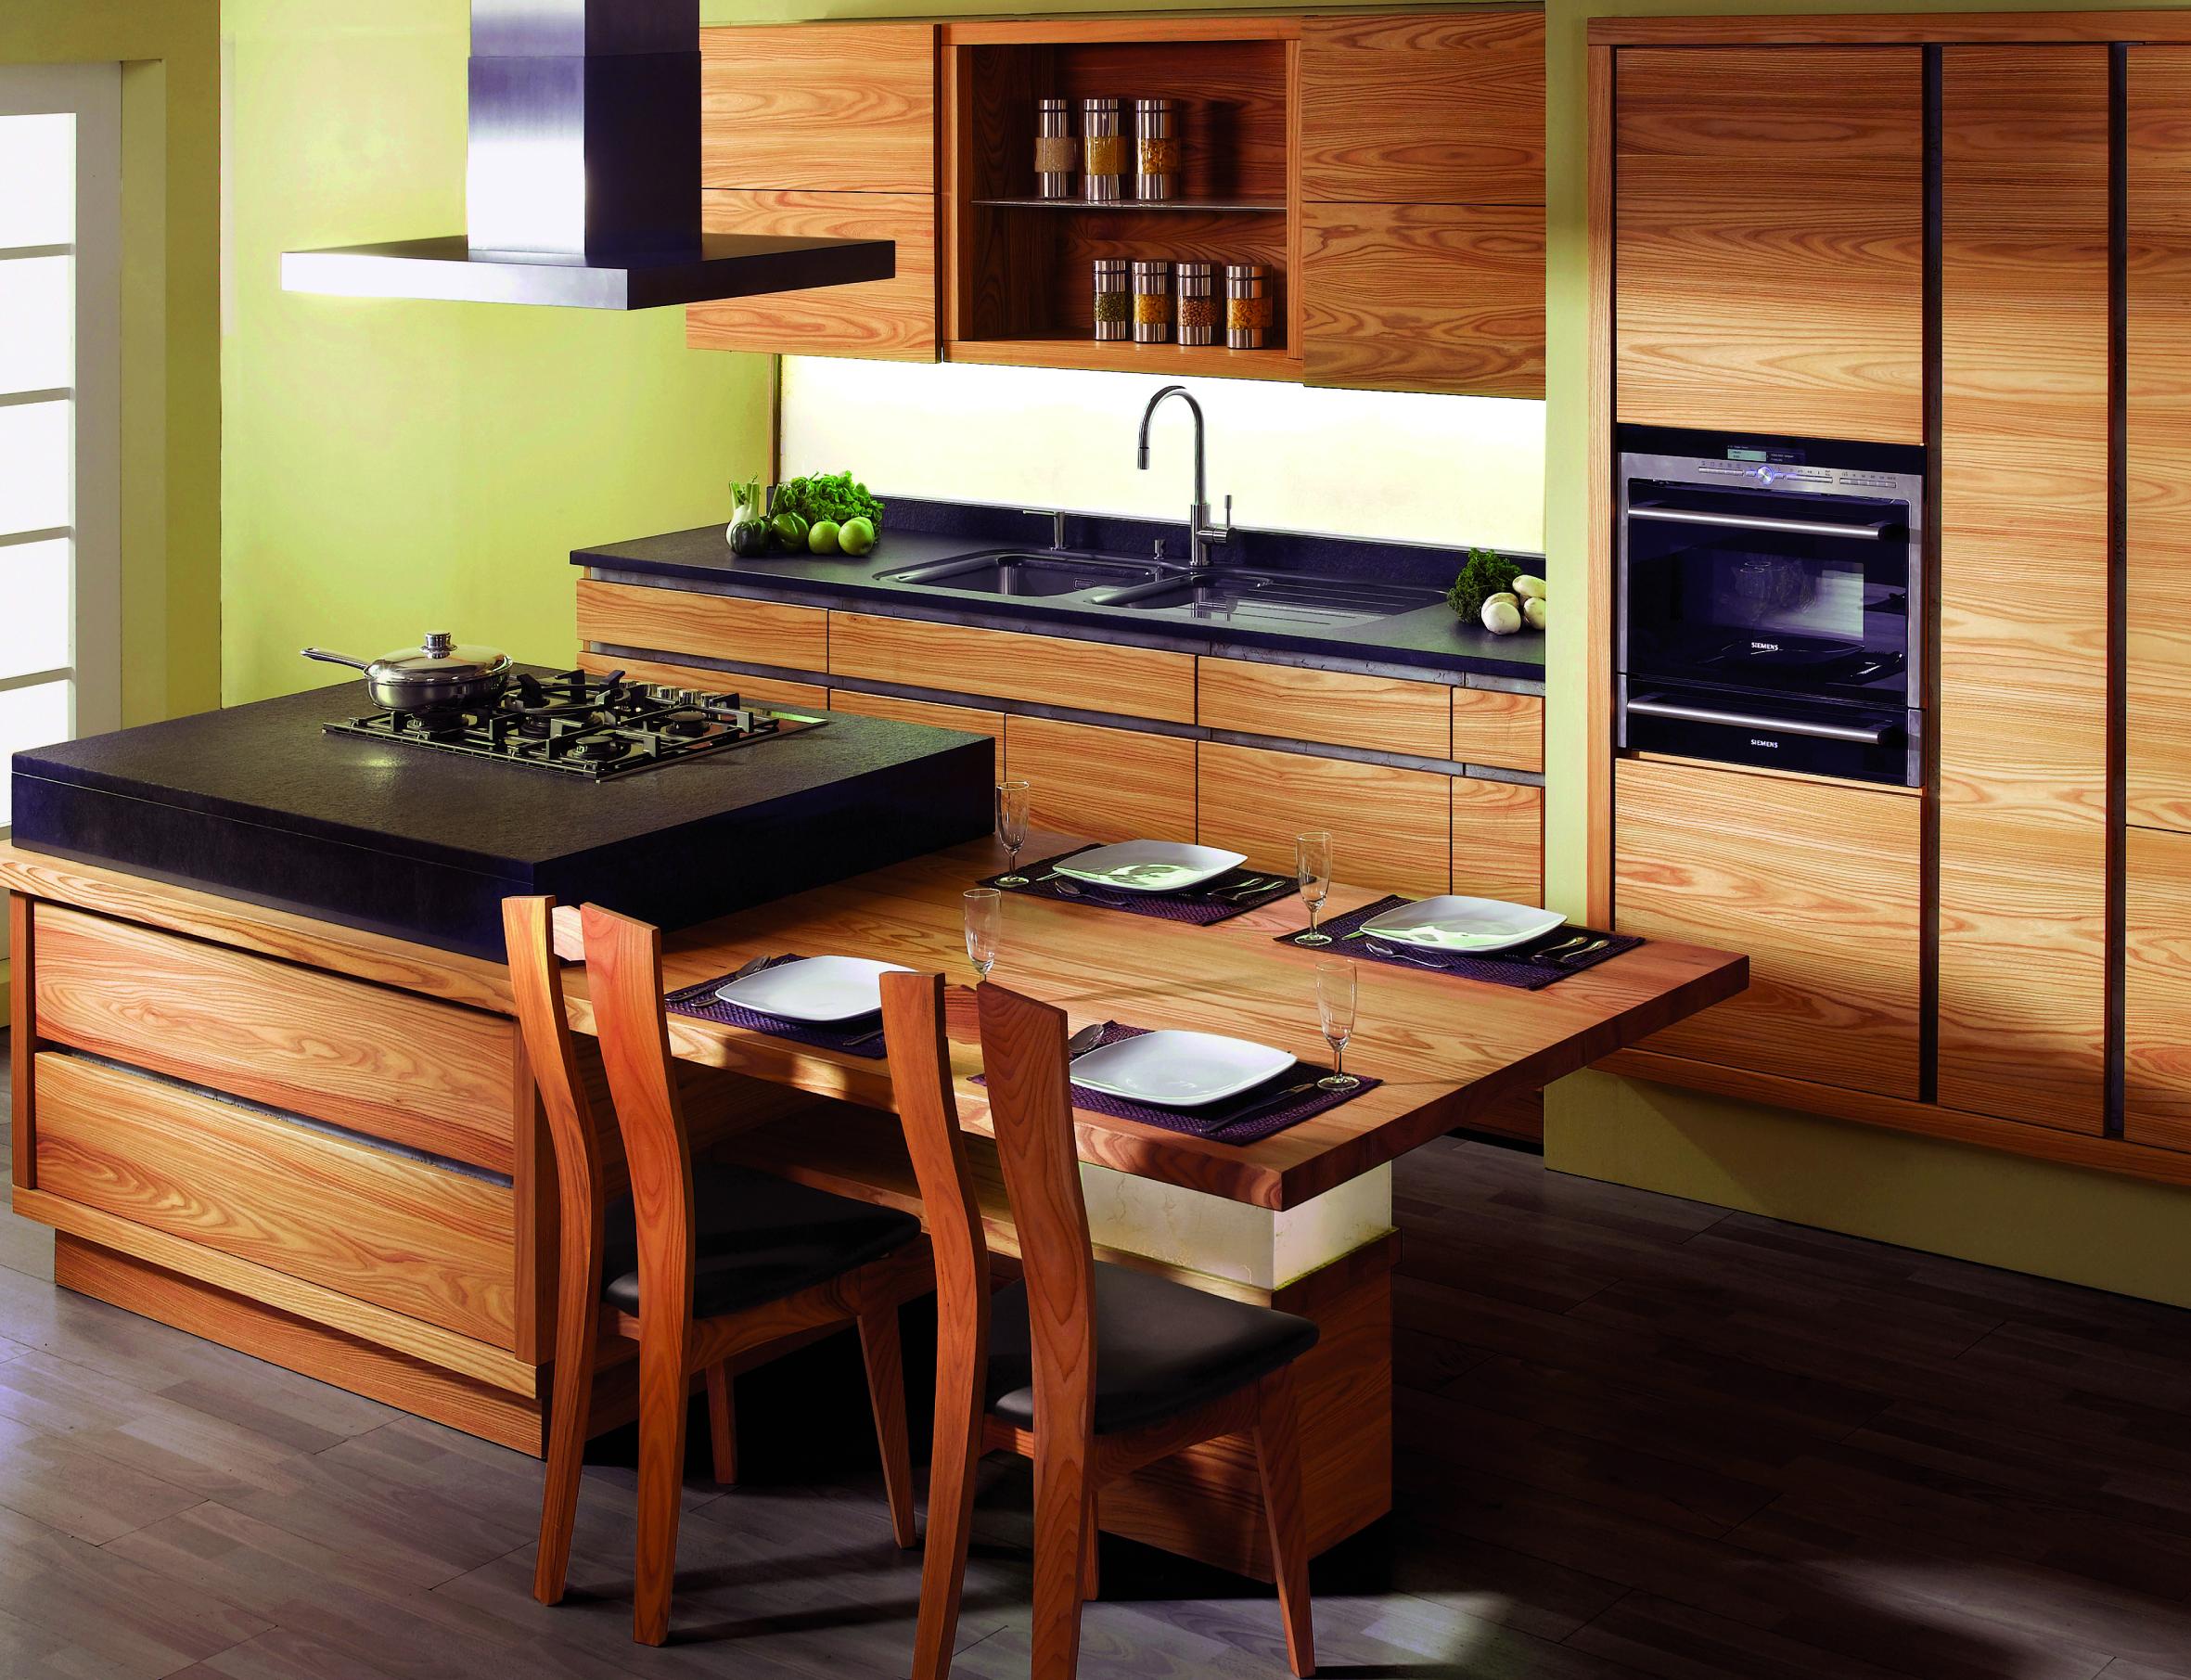 cuisine taglan cr ation. Black Bedroom Furniture Sets. Home Design Ideas